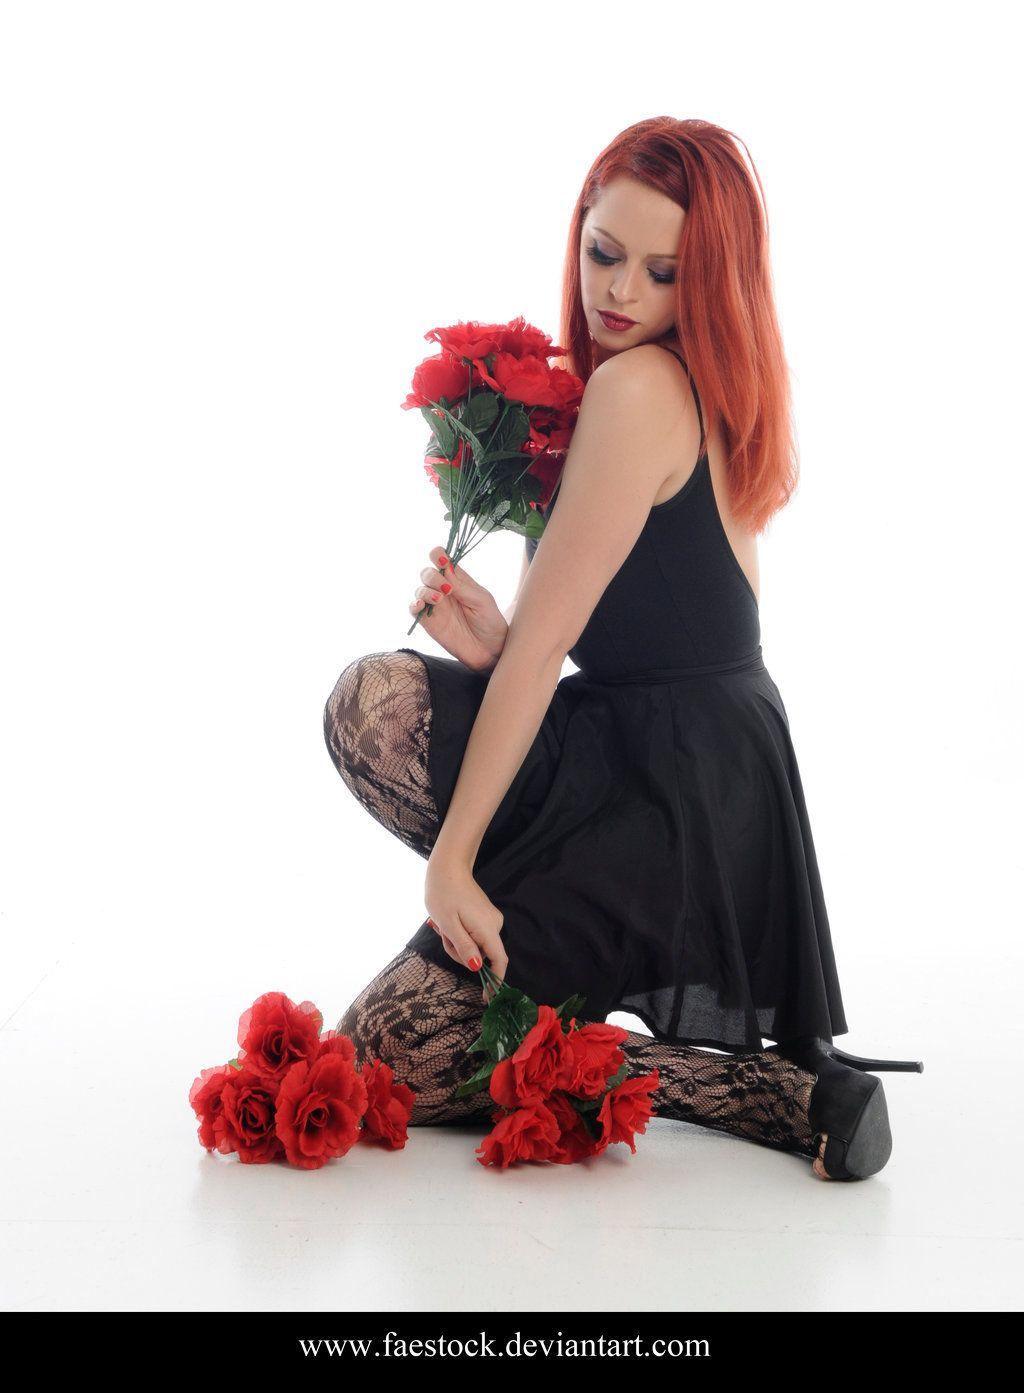 Rouge10 by faestock.deviantart.com on @deviantART